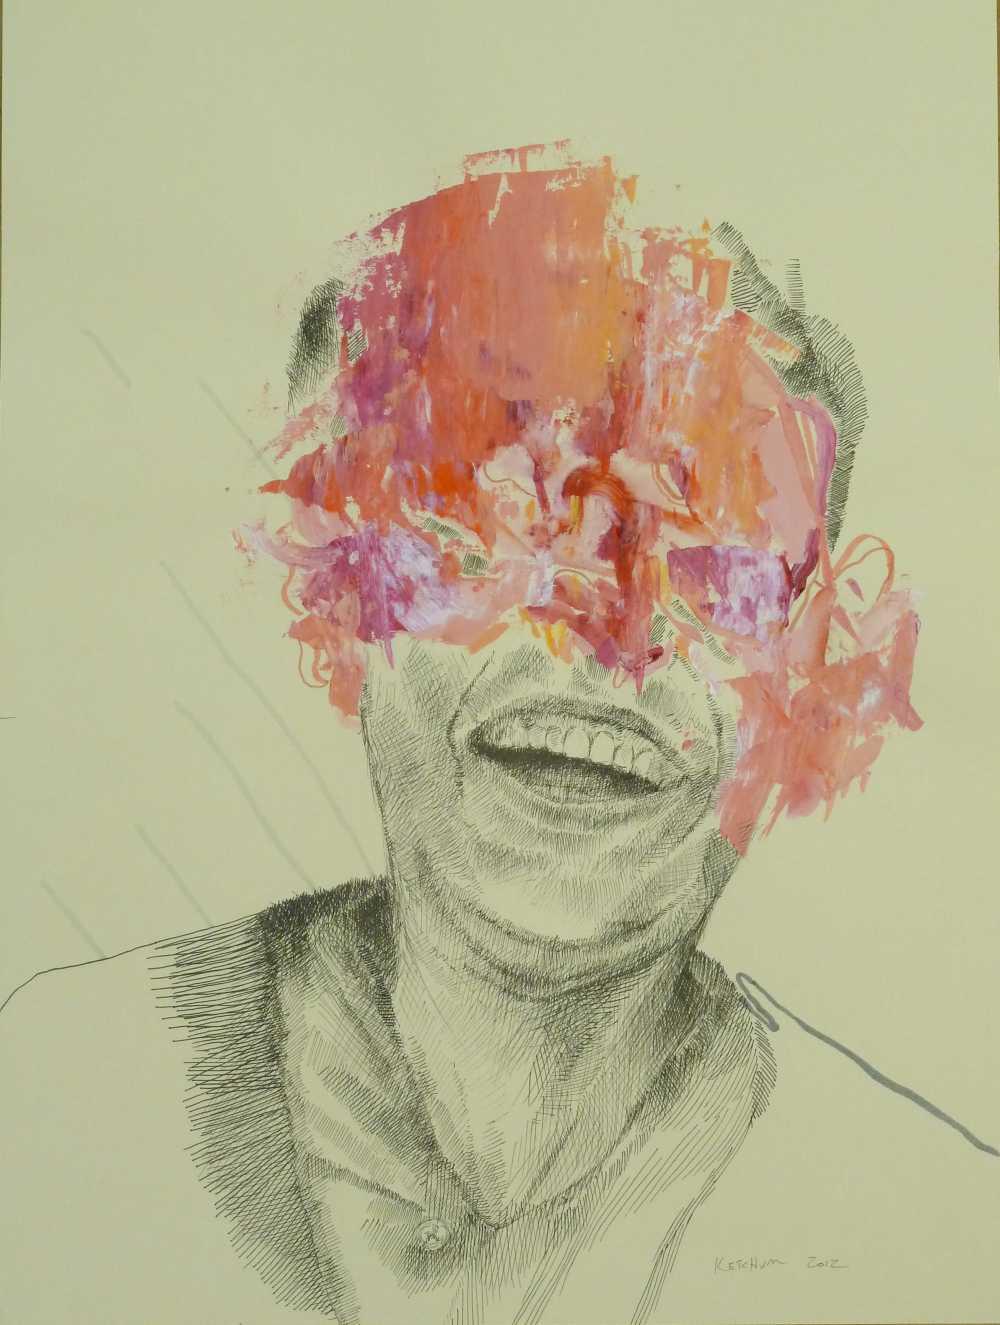 Joy of Failure - 40 cm x 30 cm, Loner Party, Steven Ketchum, artfein GALLERY